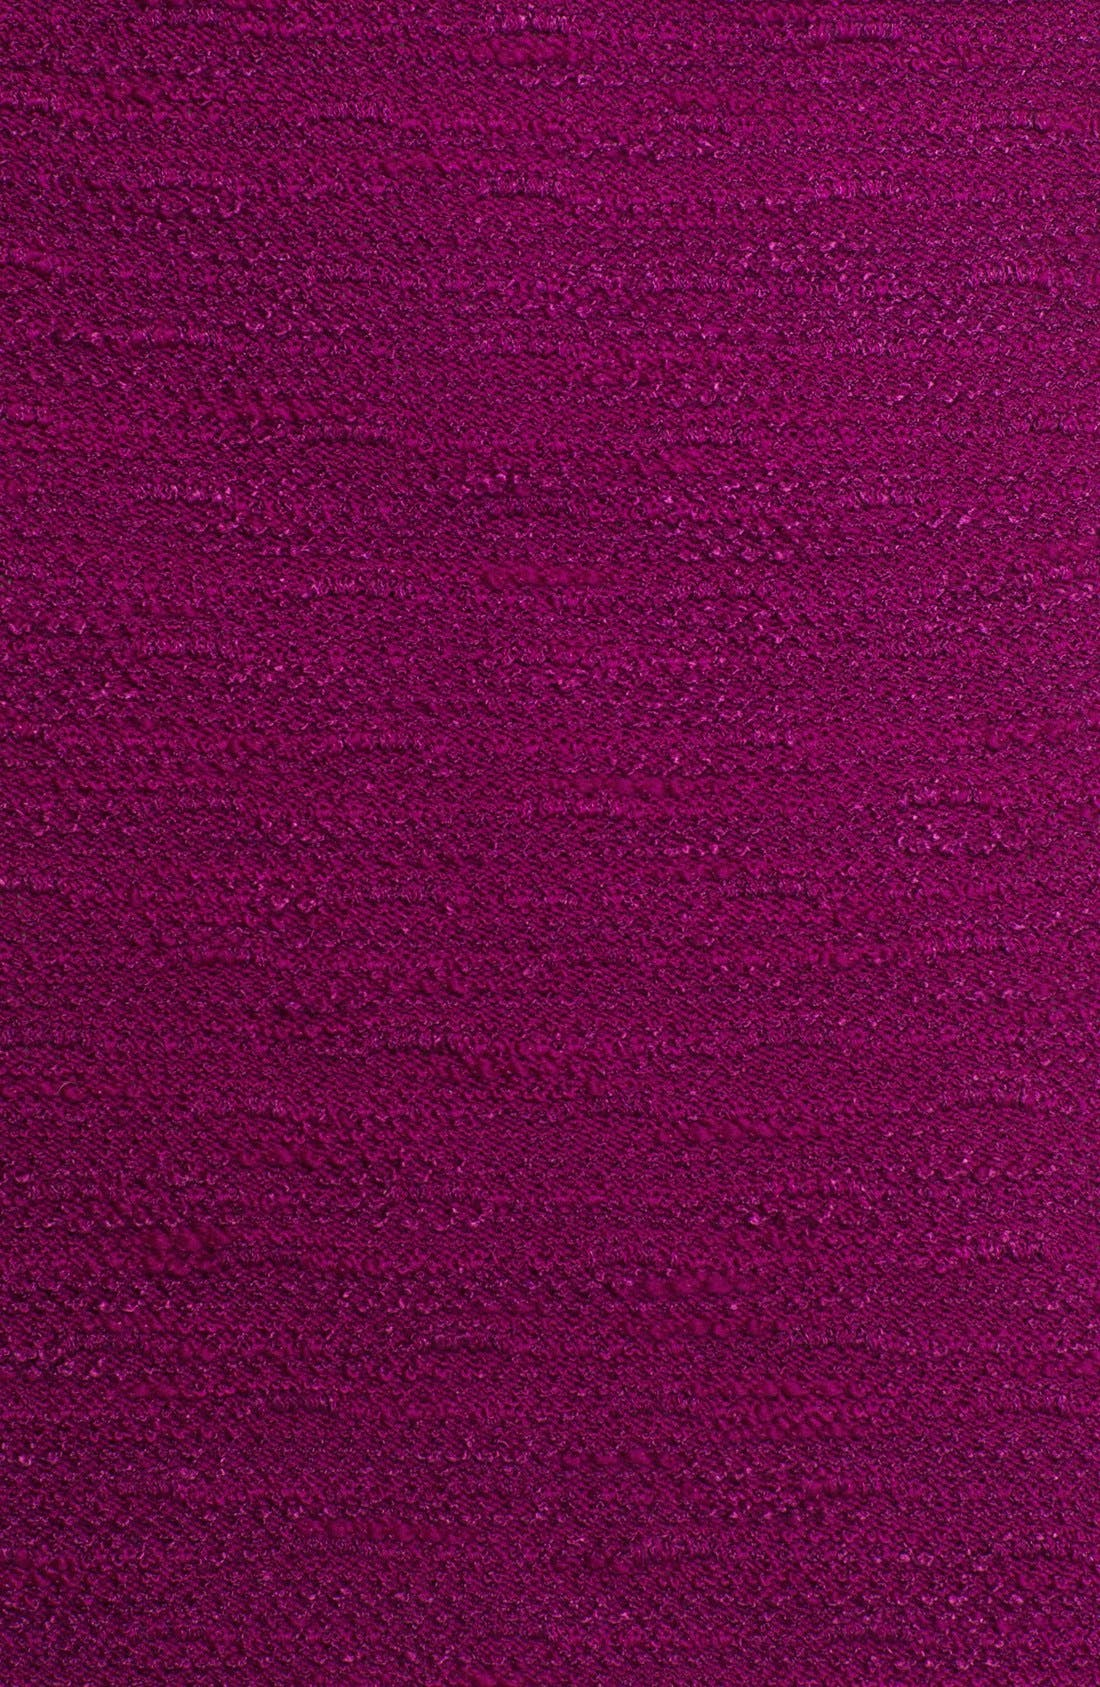 Alternate Image 3  - St. John Collection Liquid Satin & New Shantung Knit Dress (Online Only)